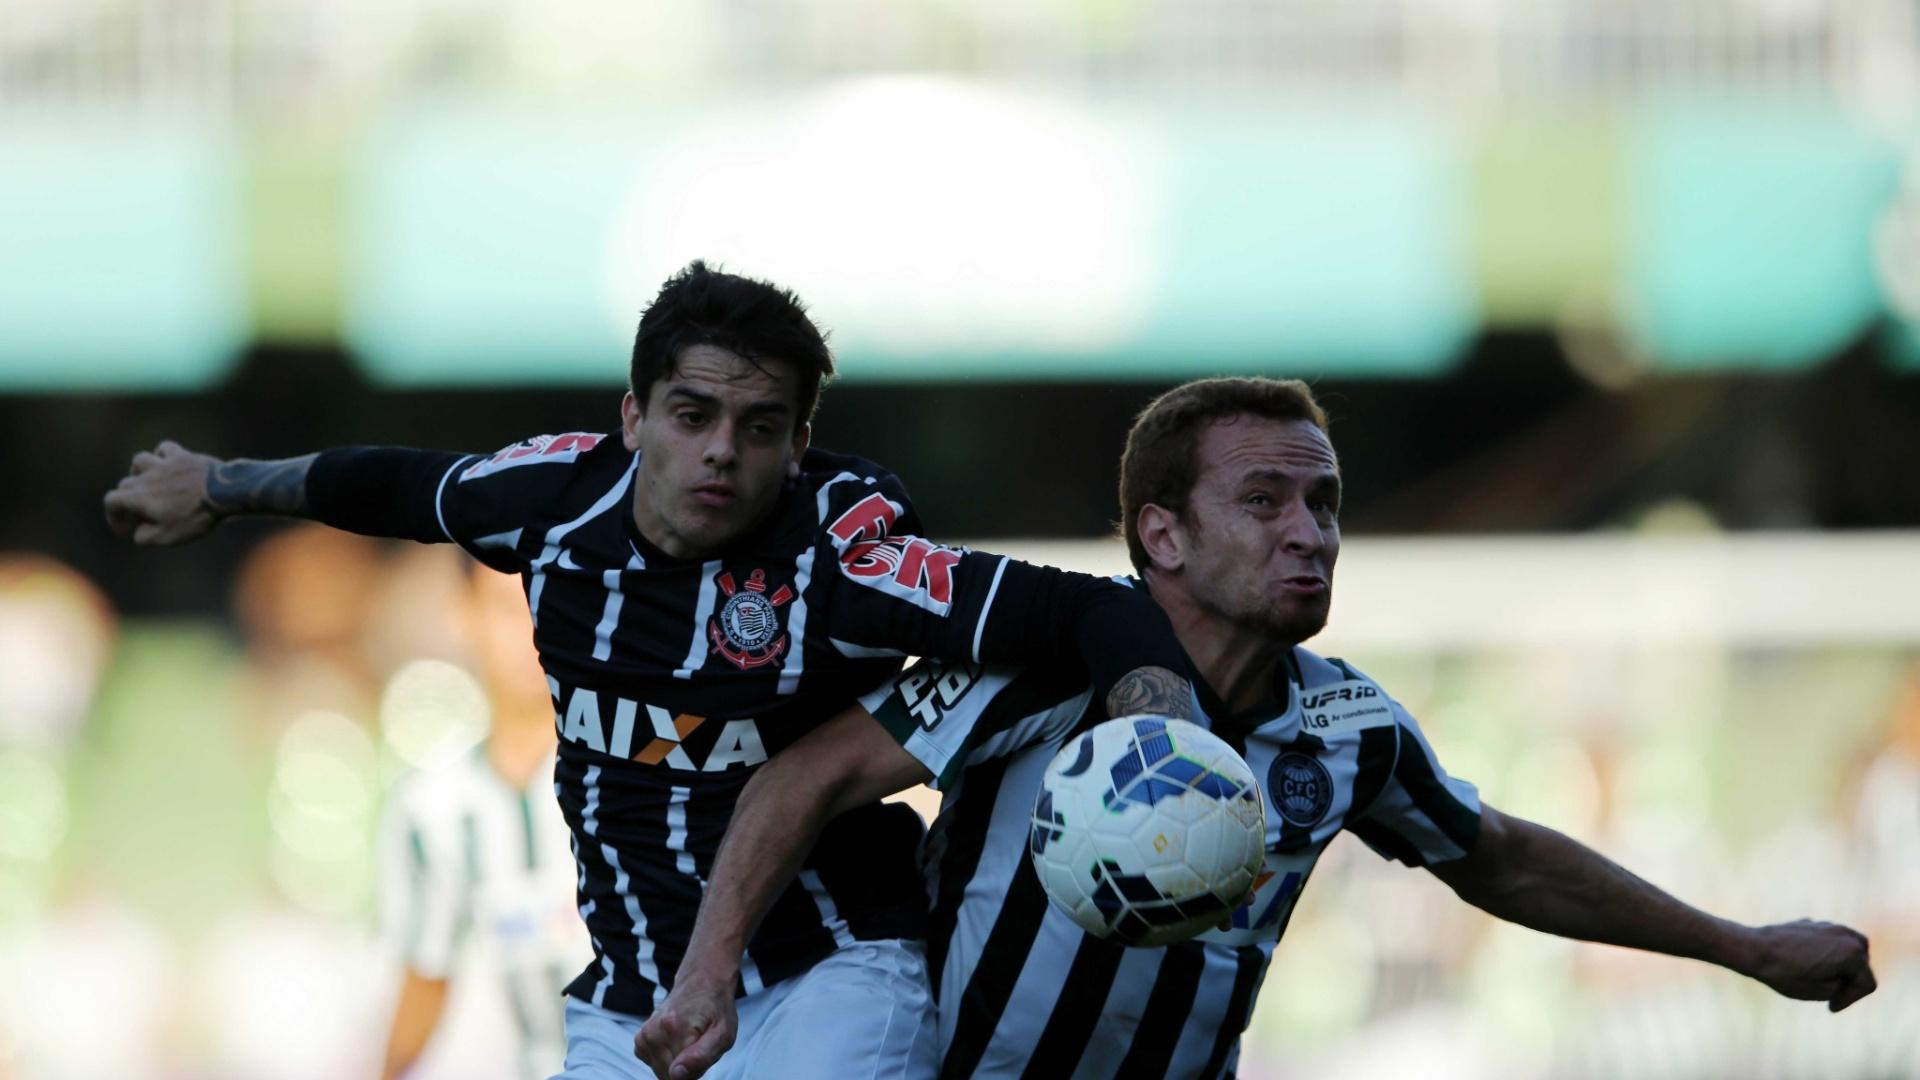 Fágner, que foi expulso no jogo entre Corinthians e Coritiba, disputa bola